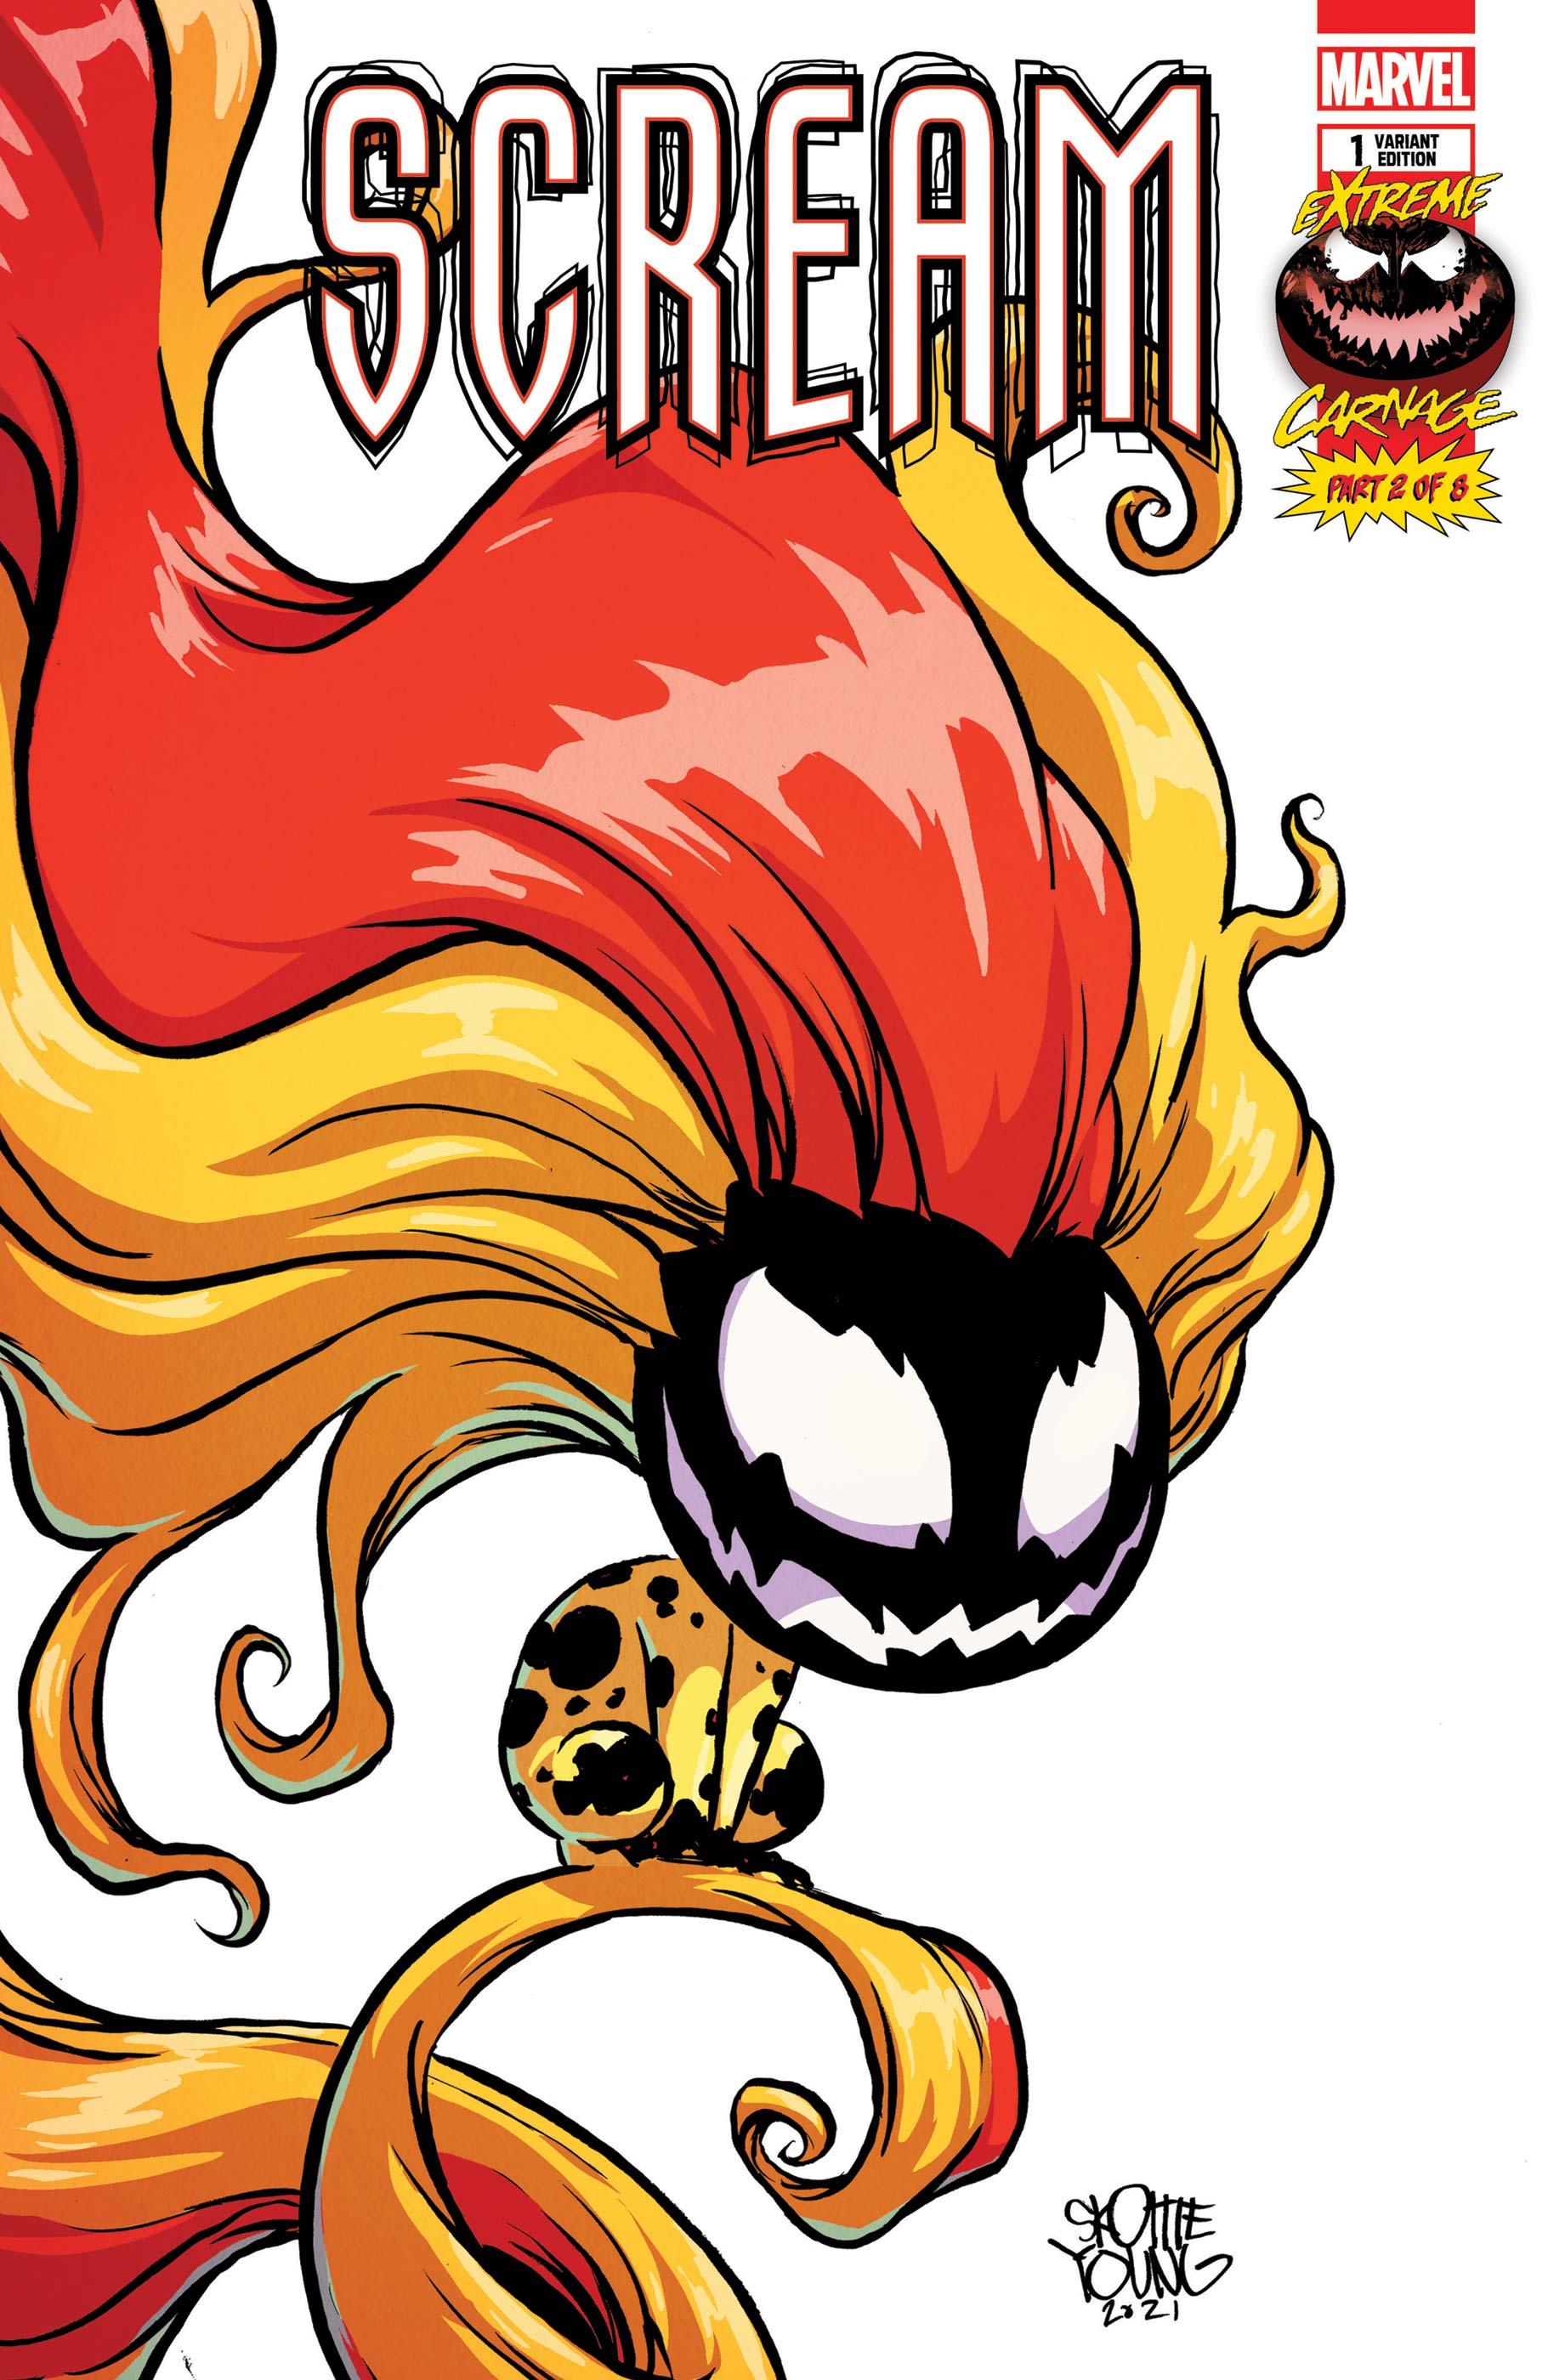 Extreme Carnage: Scream (2021) #1 (Variant)